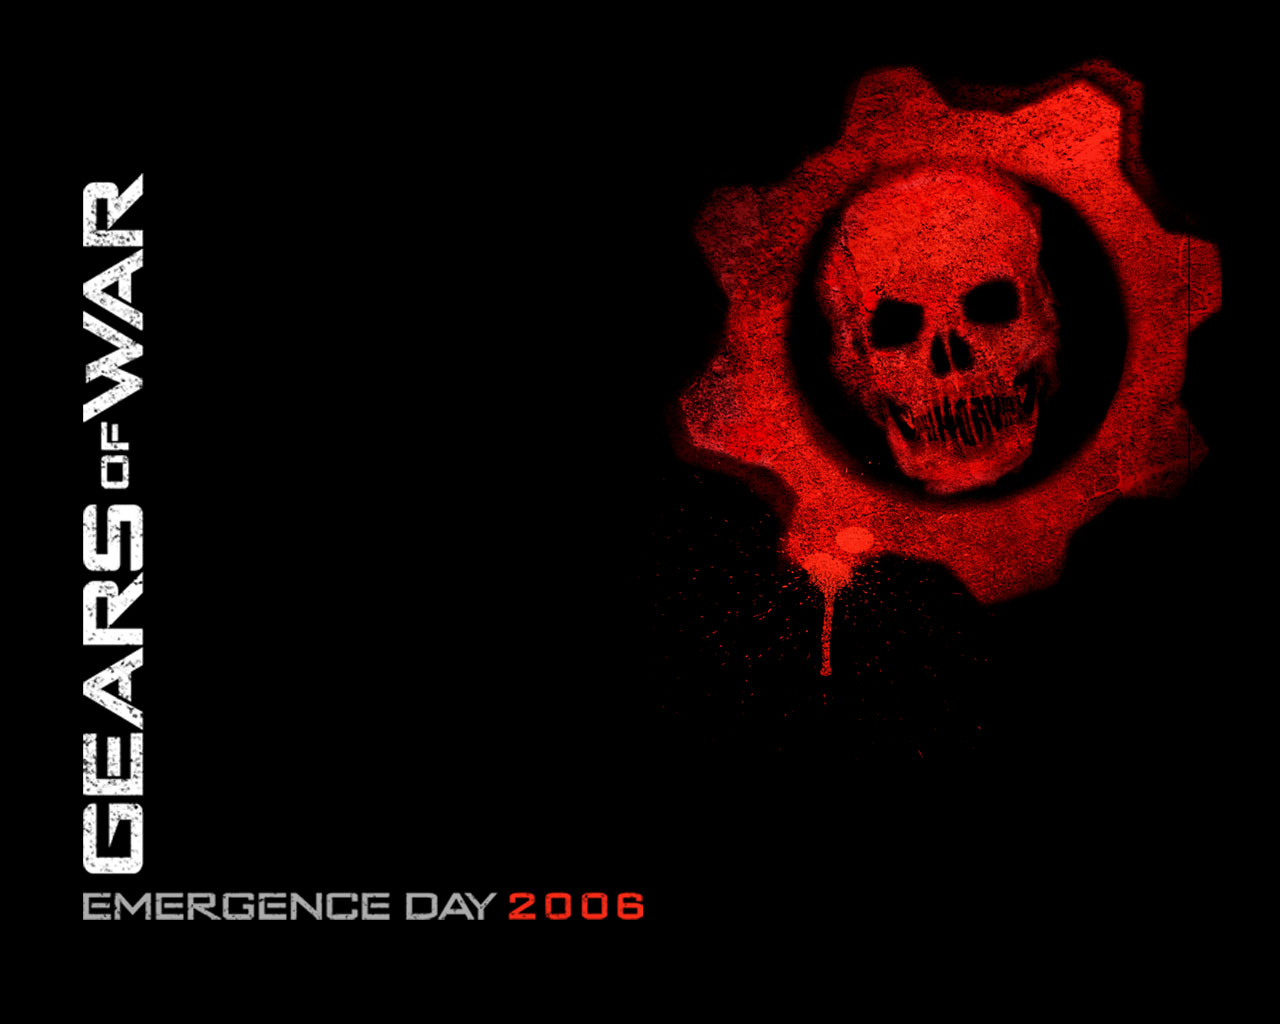 http://3.bp.blogspot.com/-M5GIA0C6x0Y/UDgXqwHZSZI/AAAAAAAAHxU/xOjdnlzoFJY/s1600/Gears_Of_War,_Emergence_Day_2006.jpg